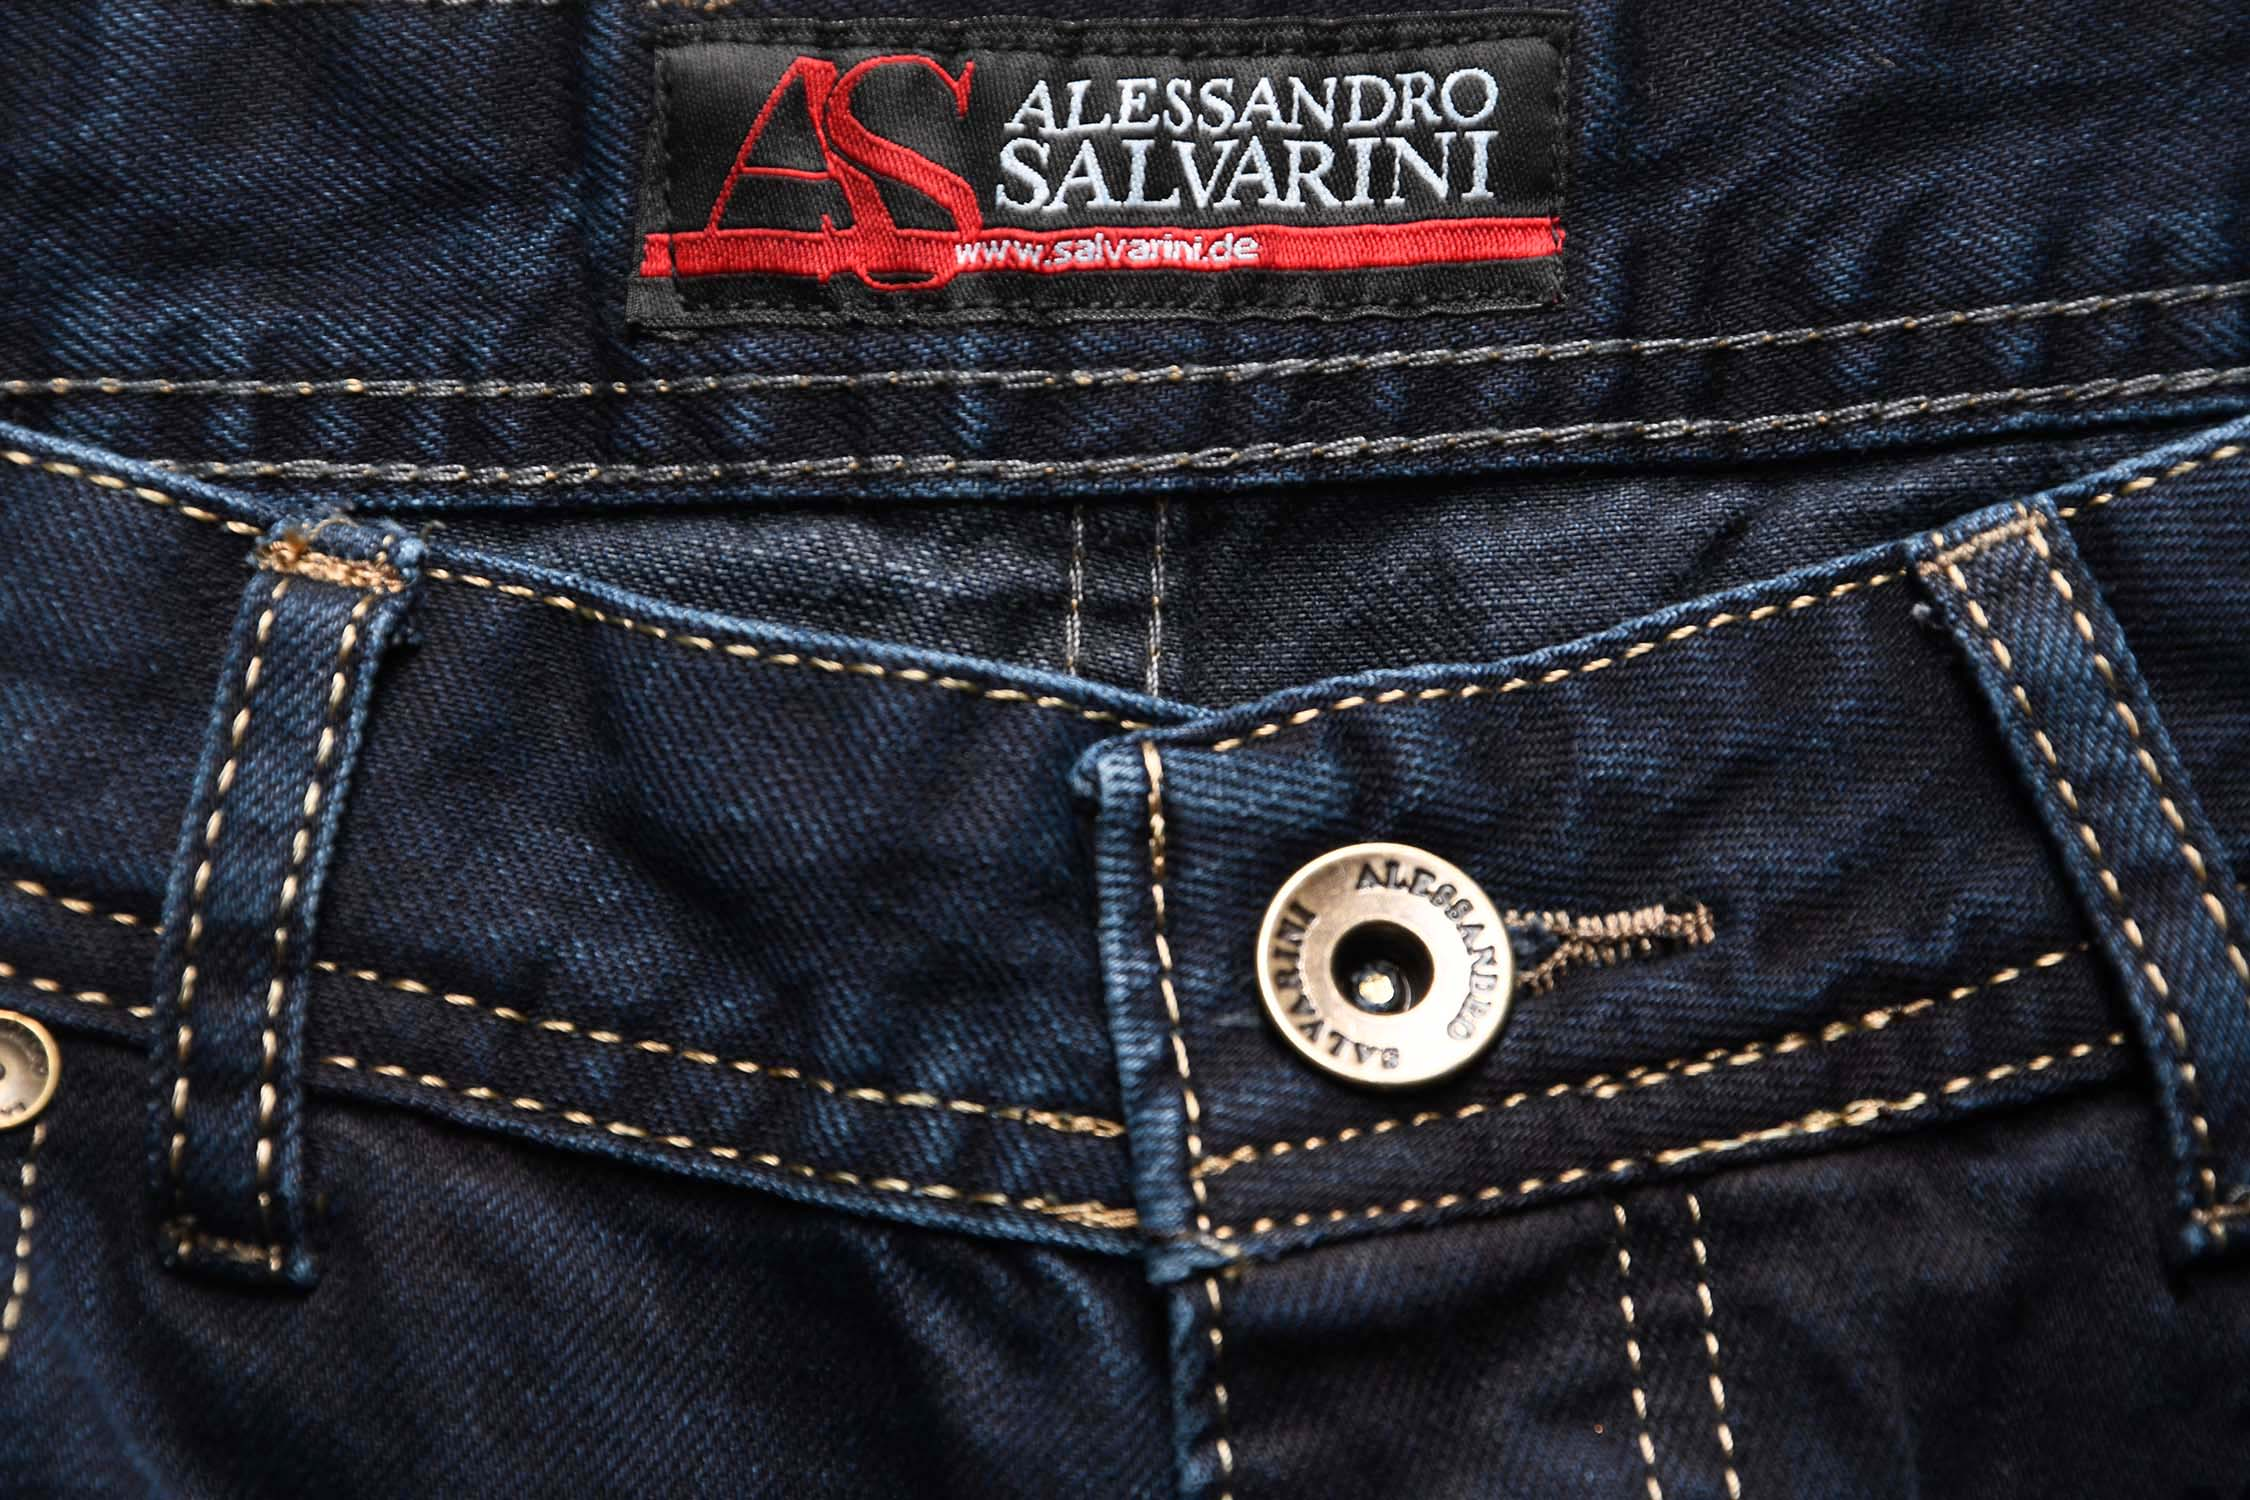 A-Salvarini-Beppo-Designer-Herren-Jeans-Hose-Basic-Jeanshose-Comfort-Fit Indexbild 24